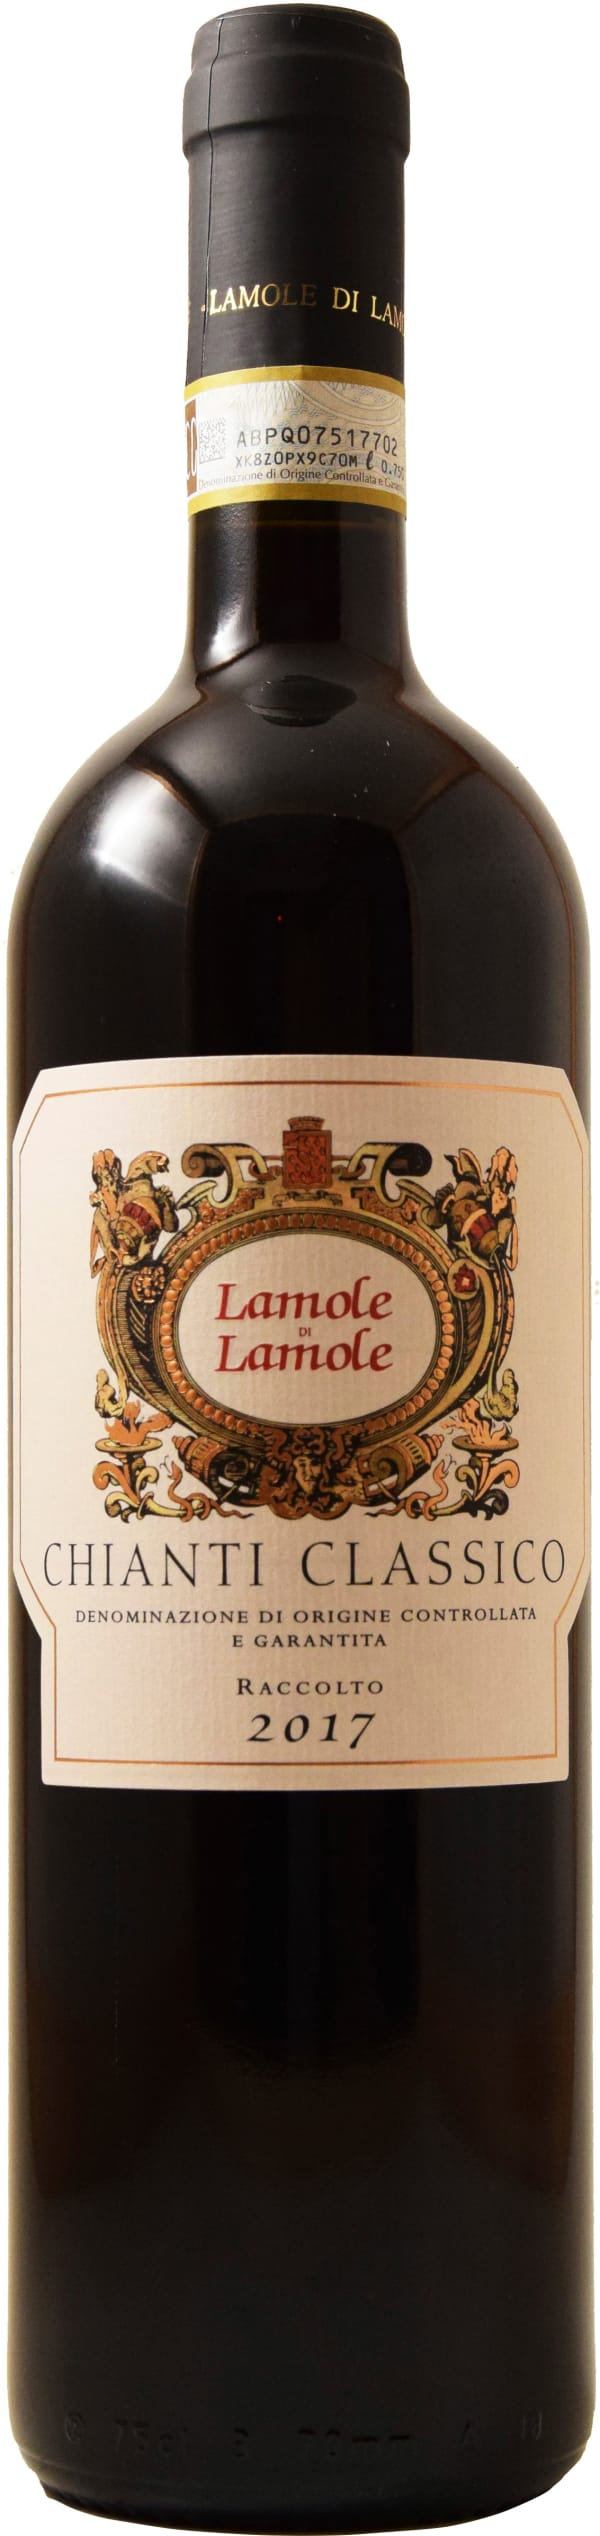 Lamole di Lamole Chianti Classico 2015